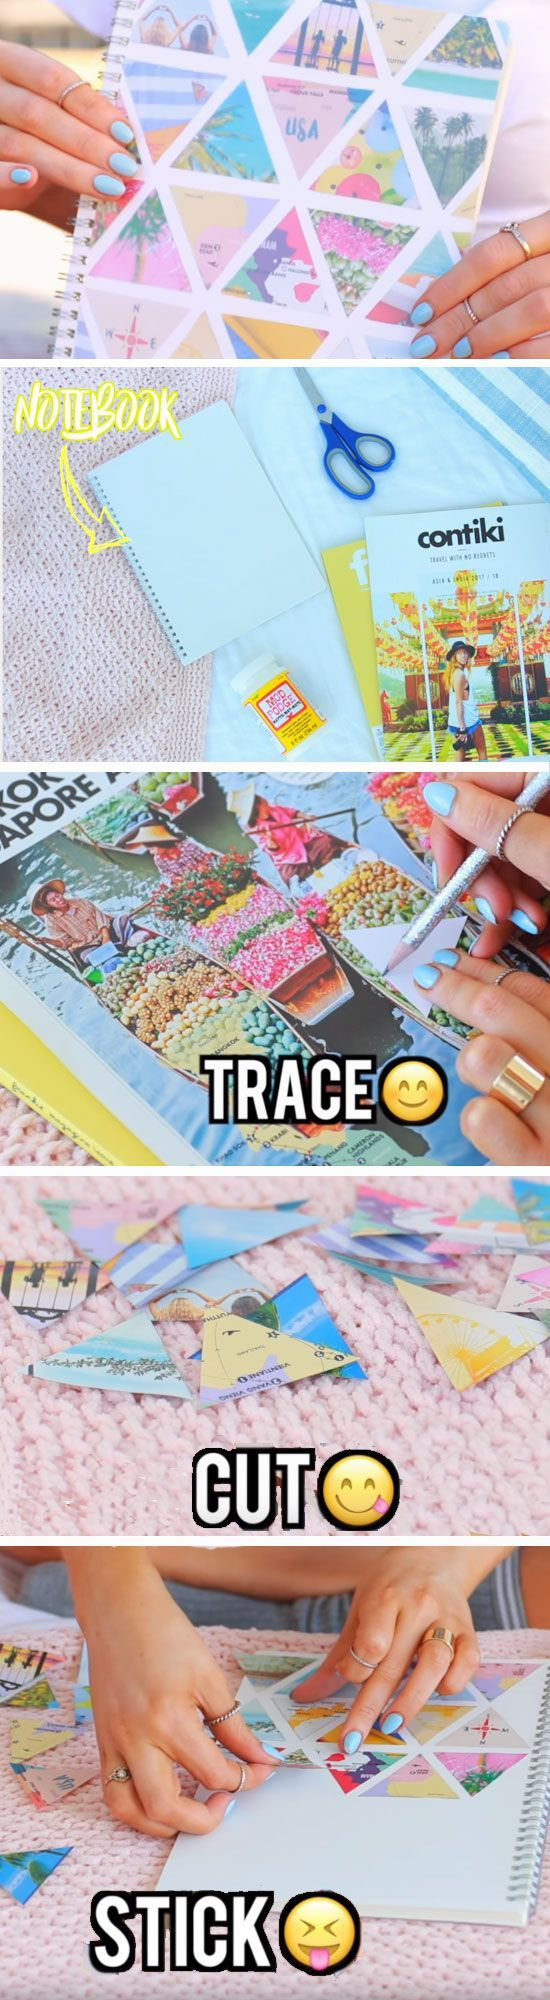 Collage Notebook | DIY School Supplies for Teens Highschool (Cool Art Ideas)